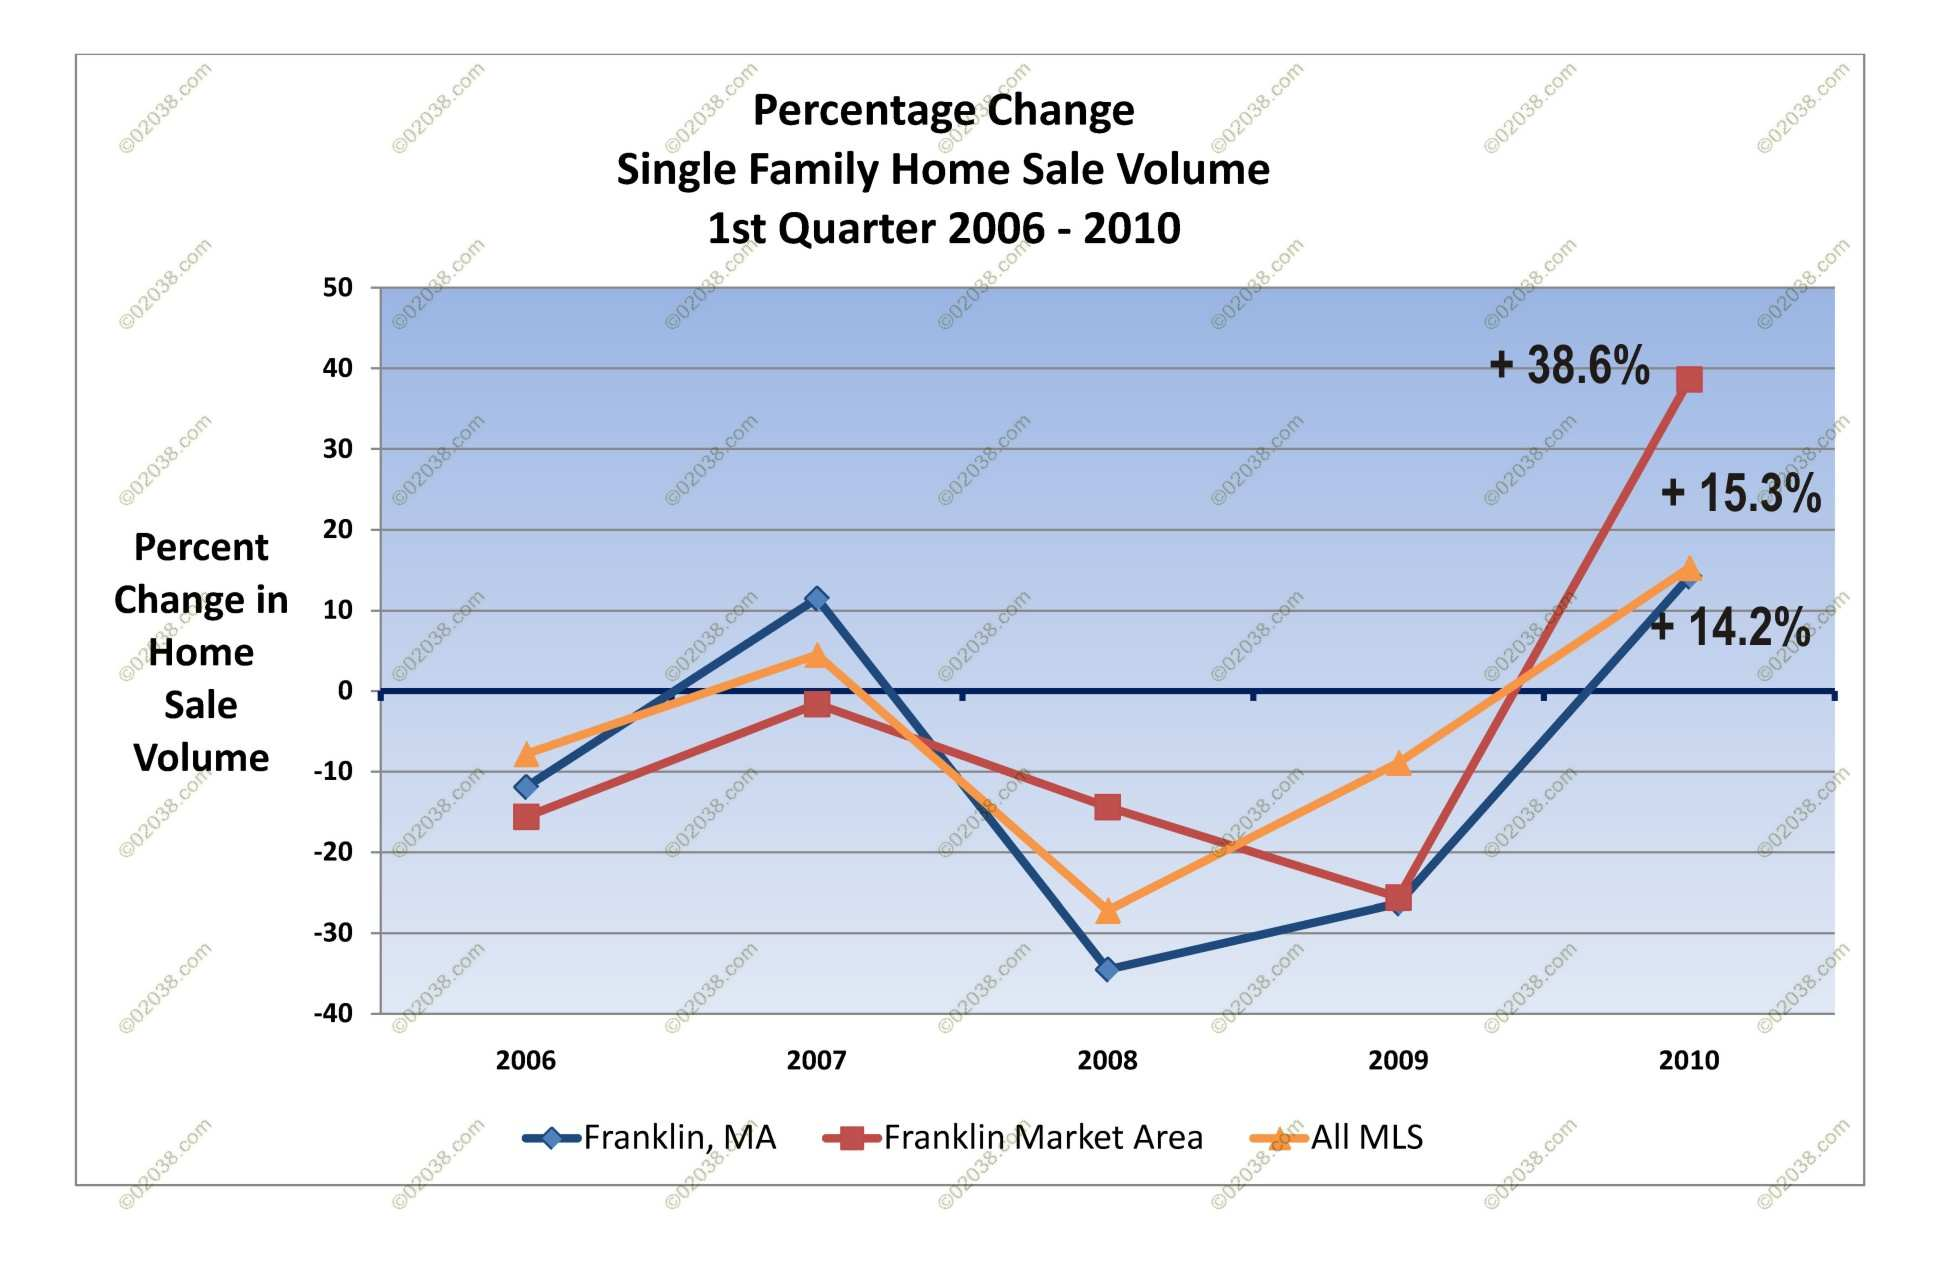 Ma Real Estate Improved In First Quarter 2010 Frankin